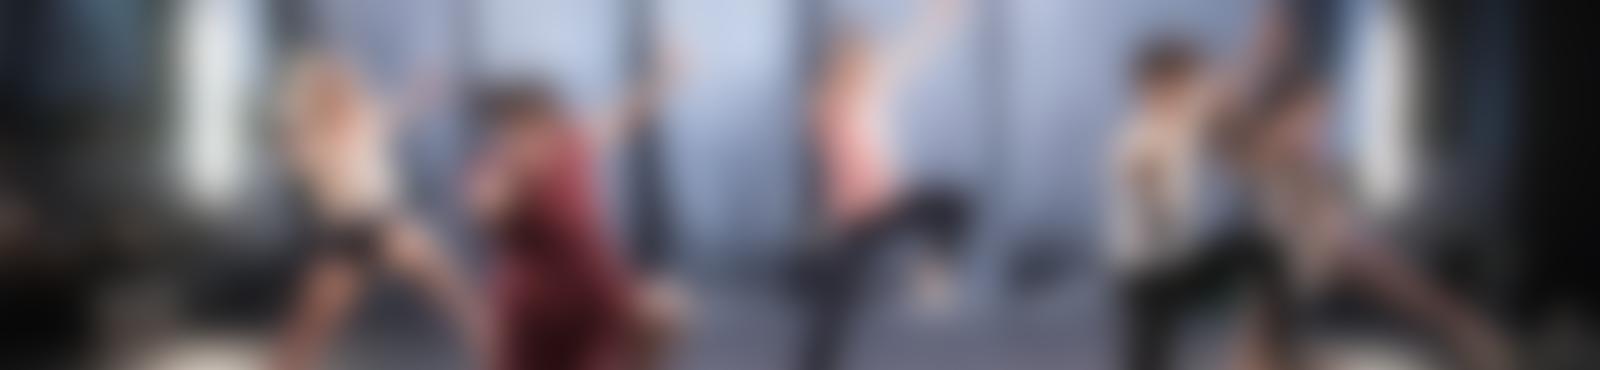 Blurred ad91514d ebf1 4601 8f29 ae3a45bc7cb4